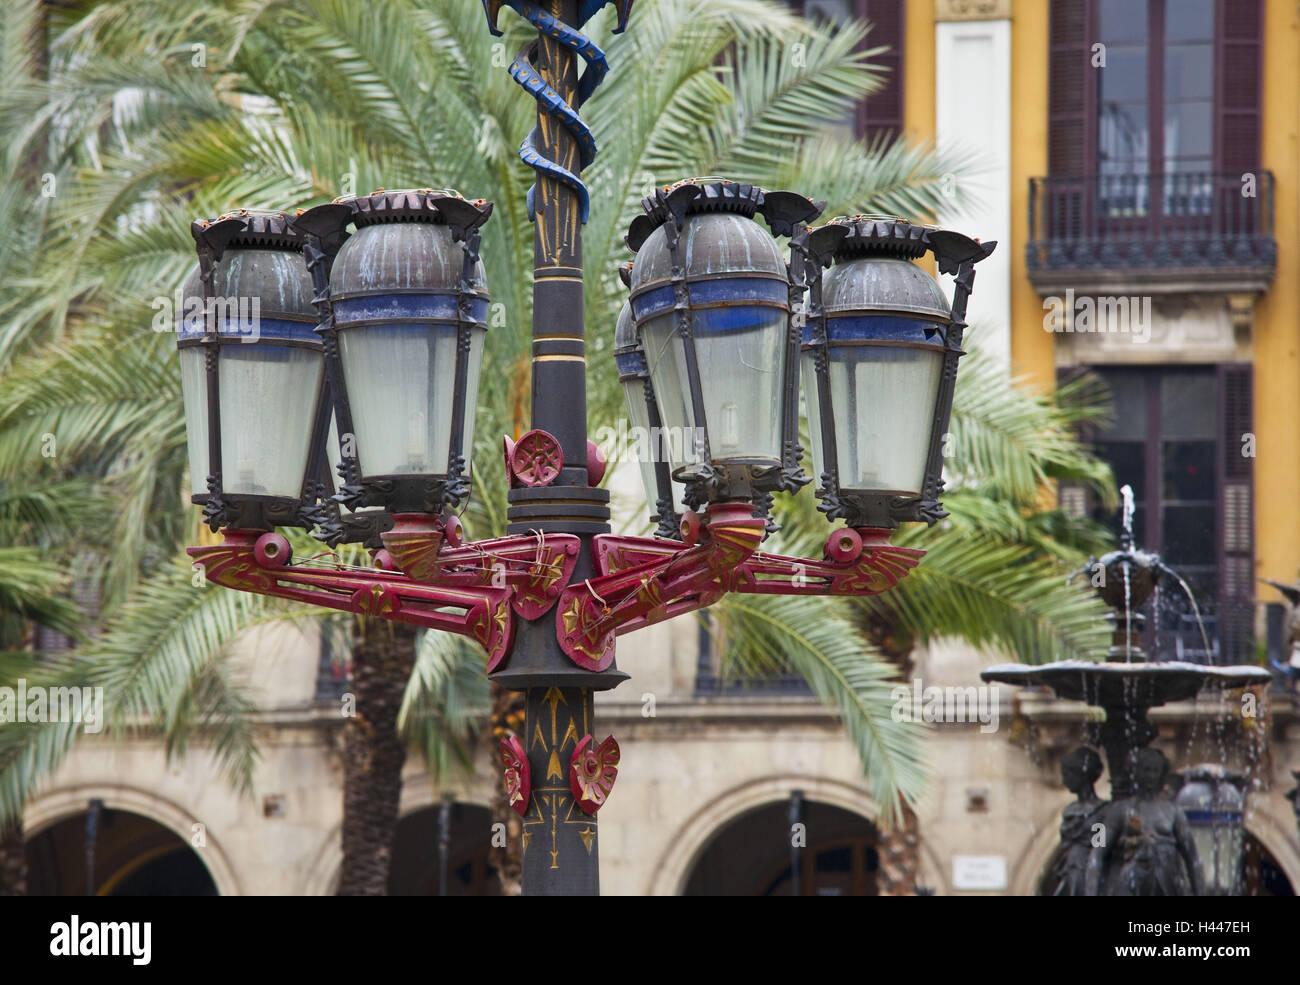 Spain, Catalonia, Barcelona, Placa Reial, palms, lantern, - Stock Image